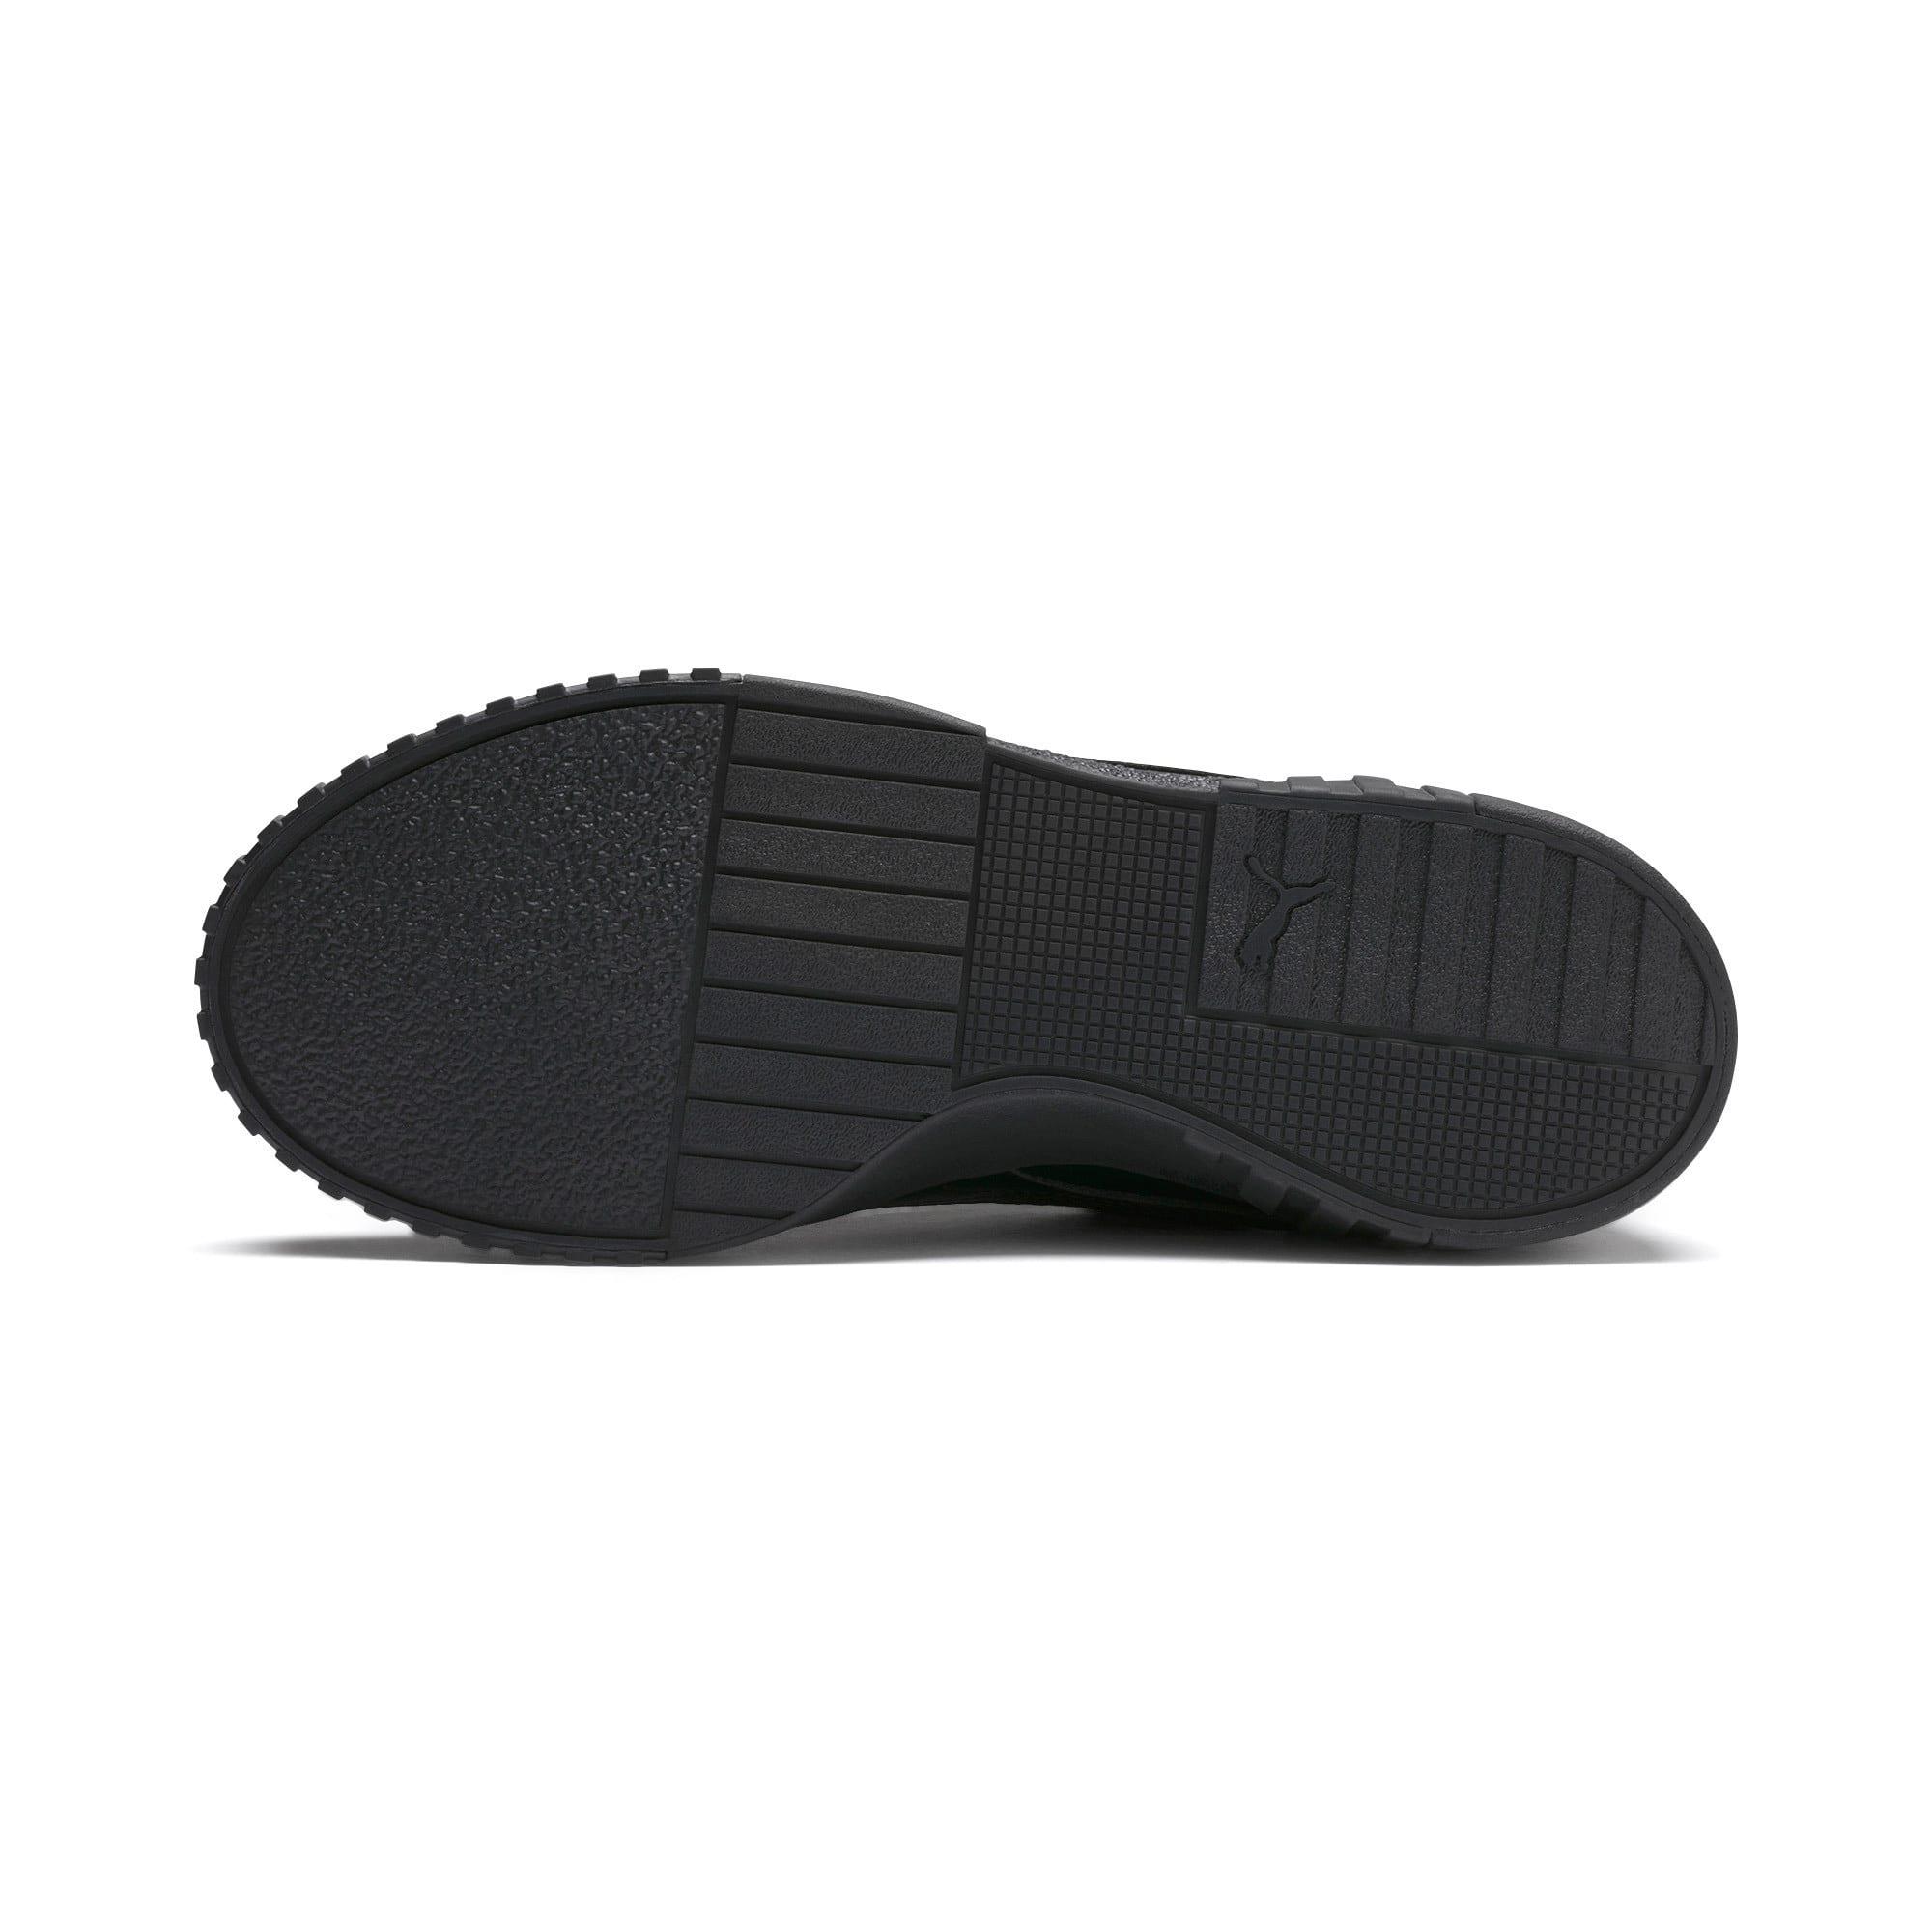 Thumbnail 5 of Sneakers Cali donna, Puma Black-Puma Black, medium